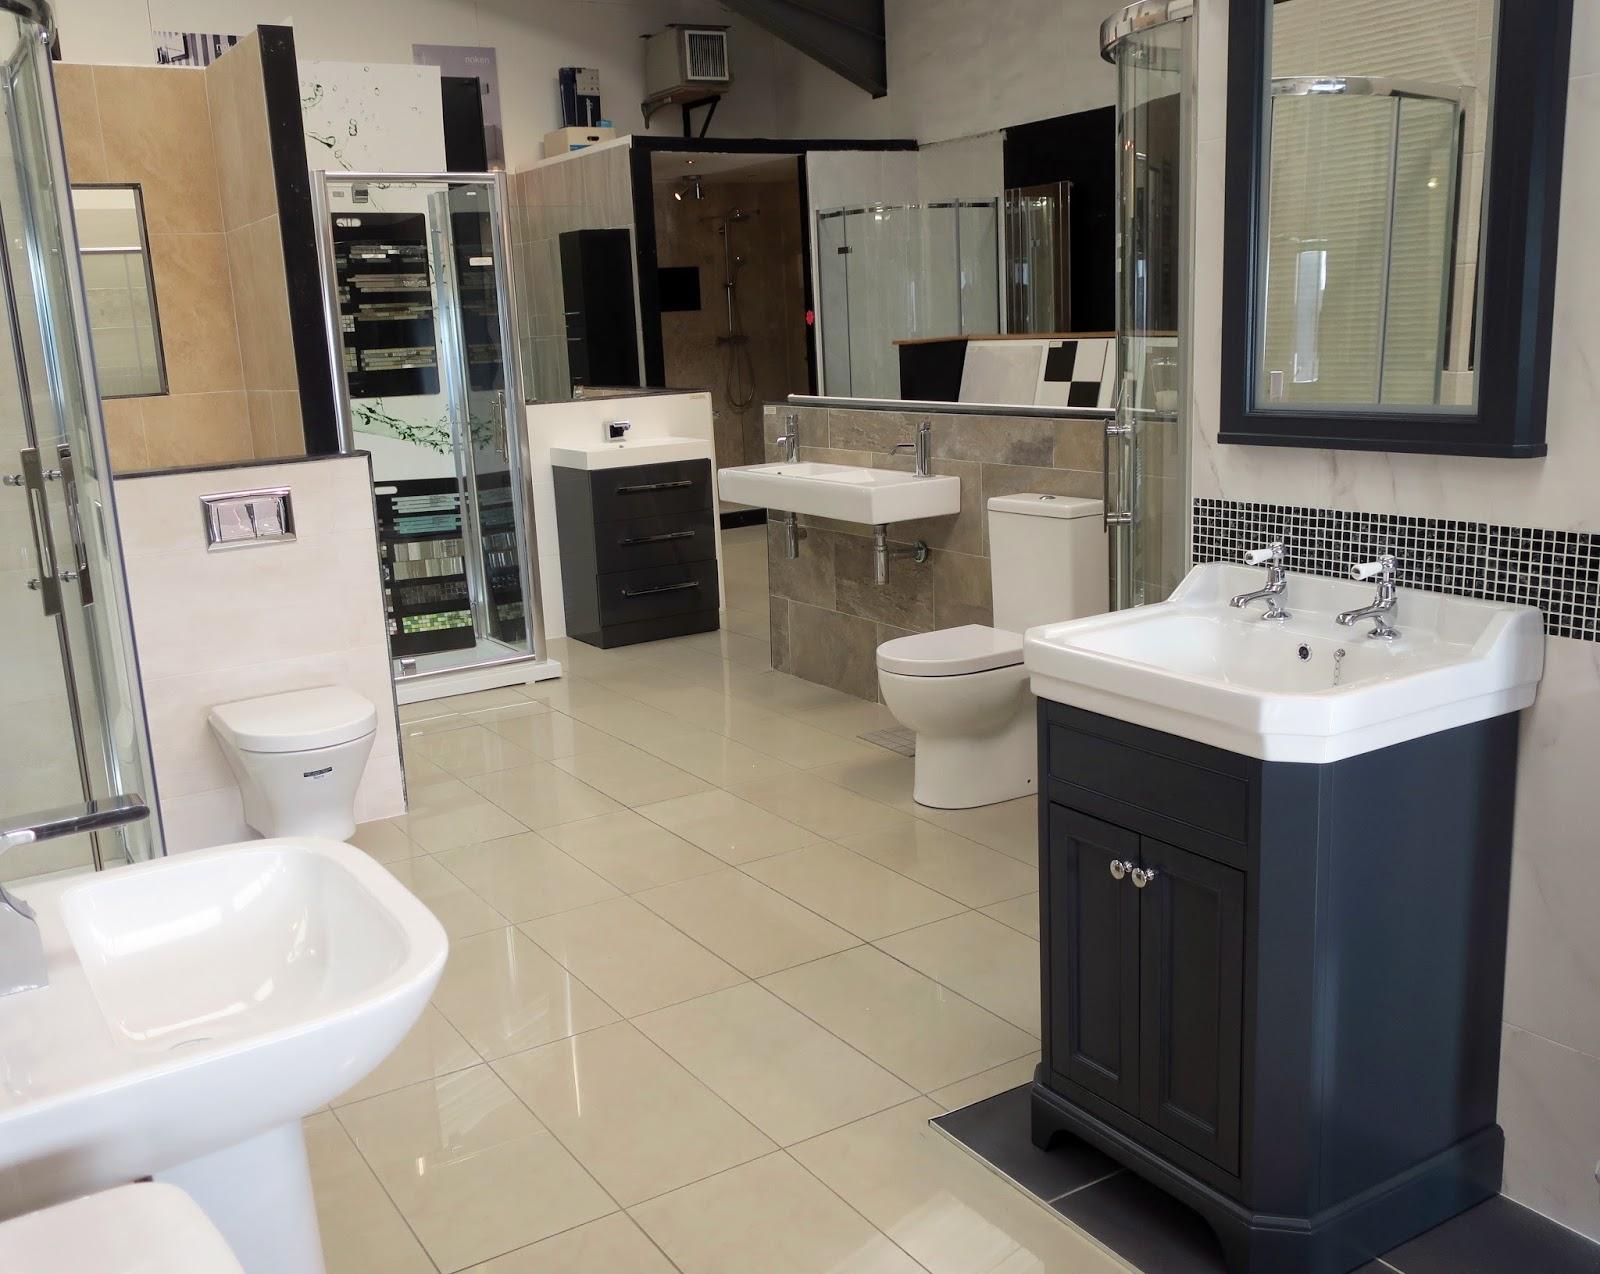 kilcullen diary reviving the neglected bathroom